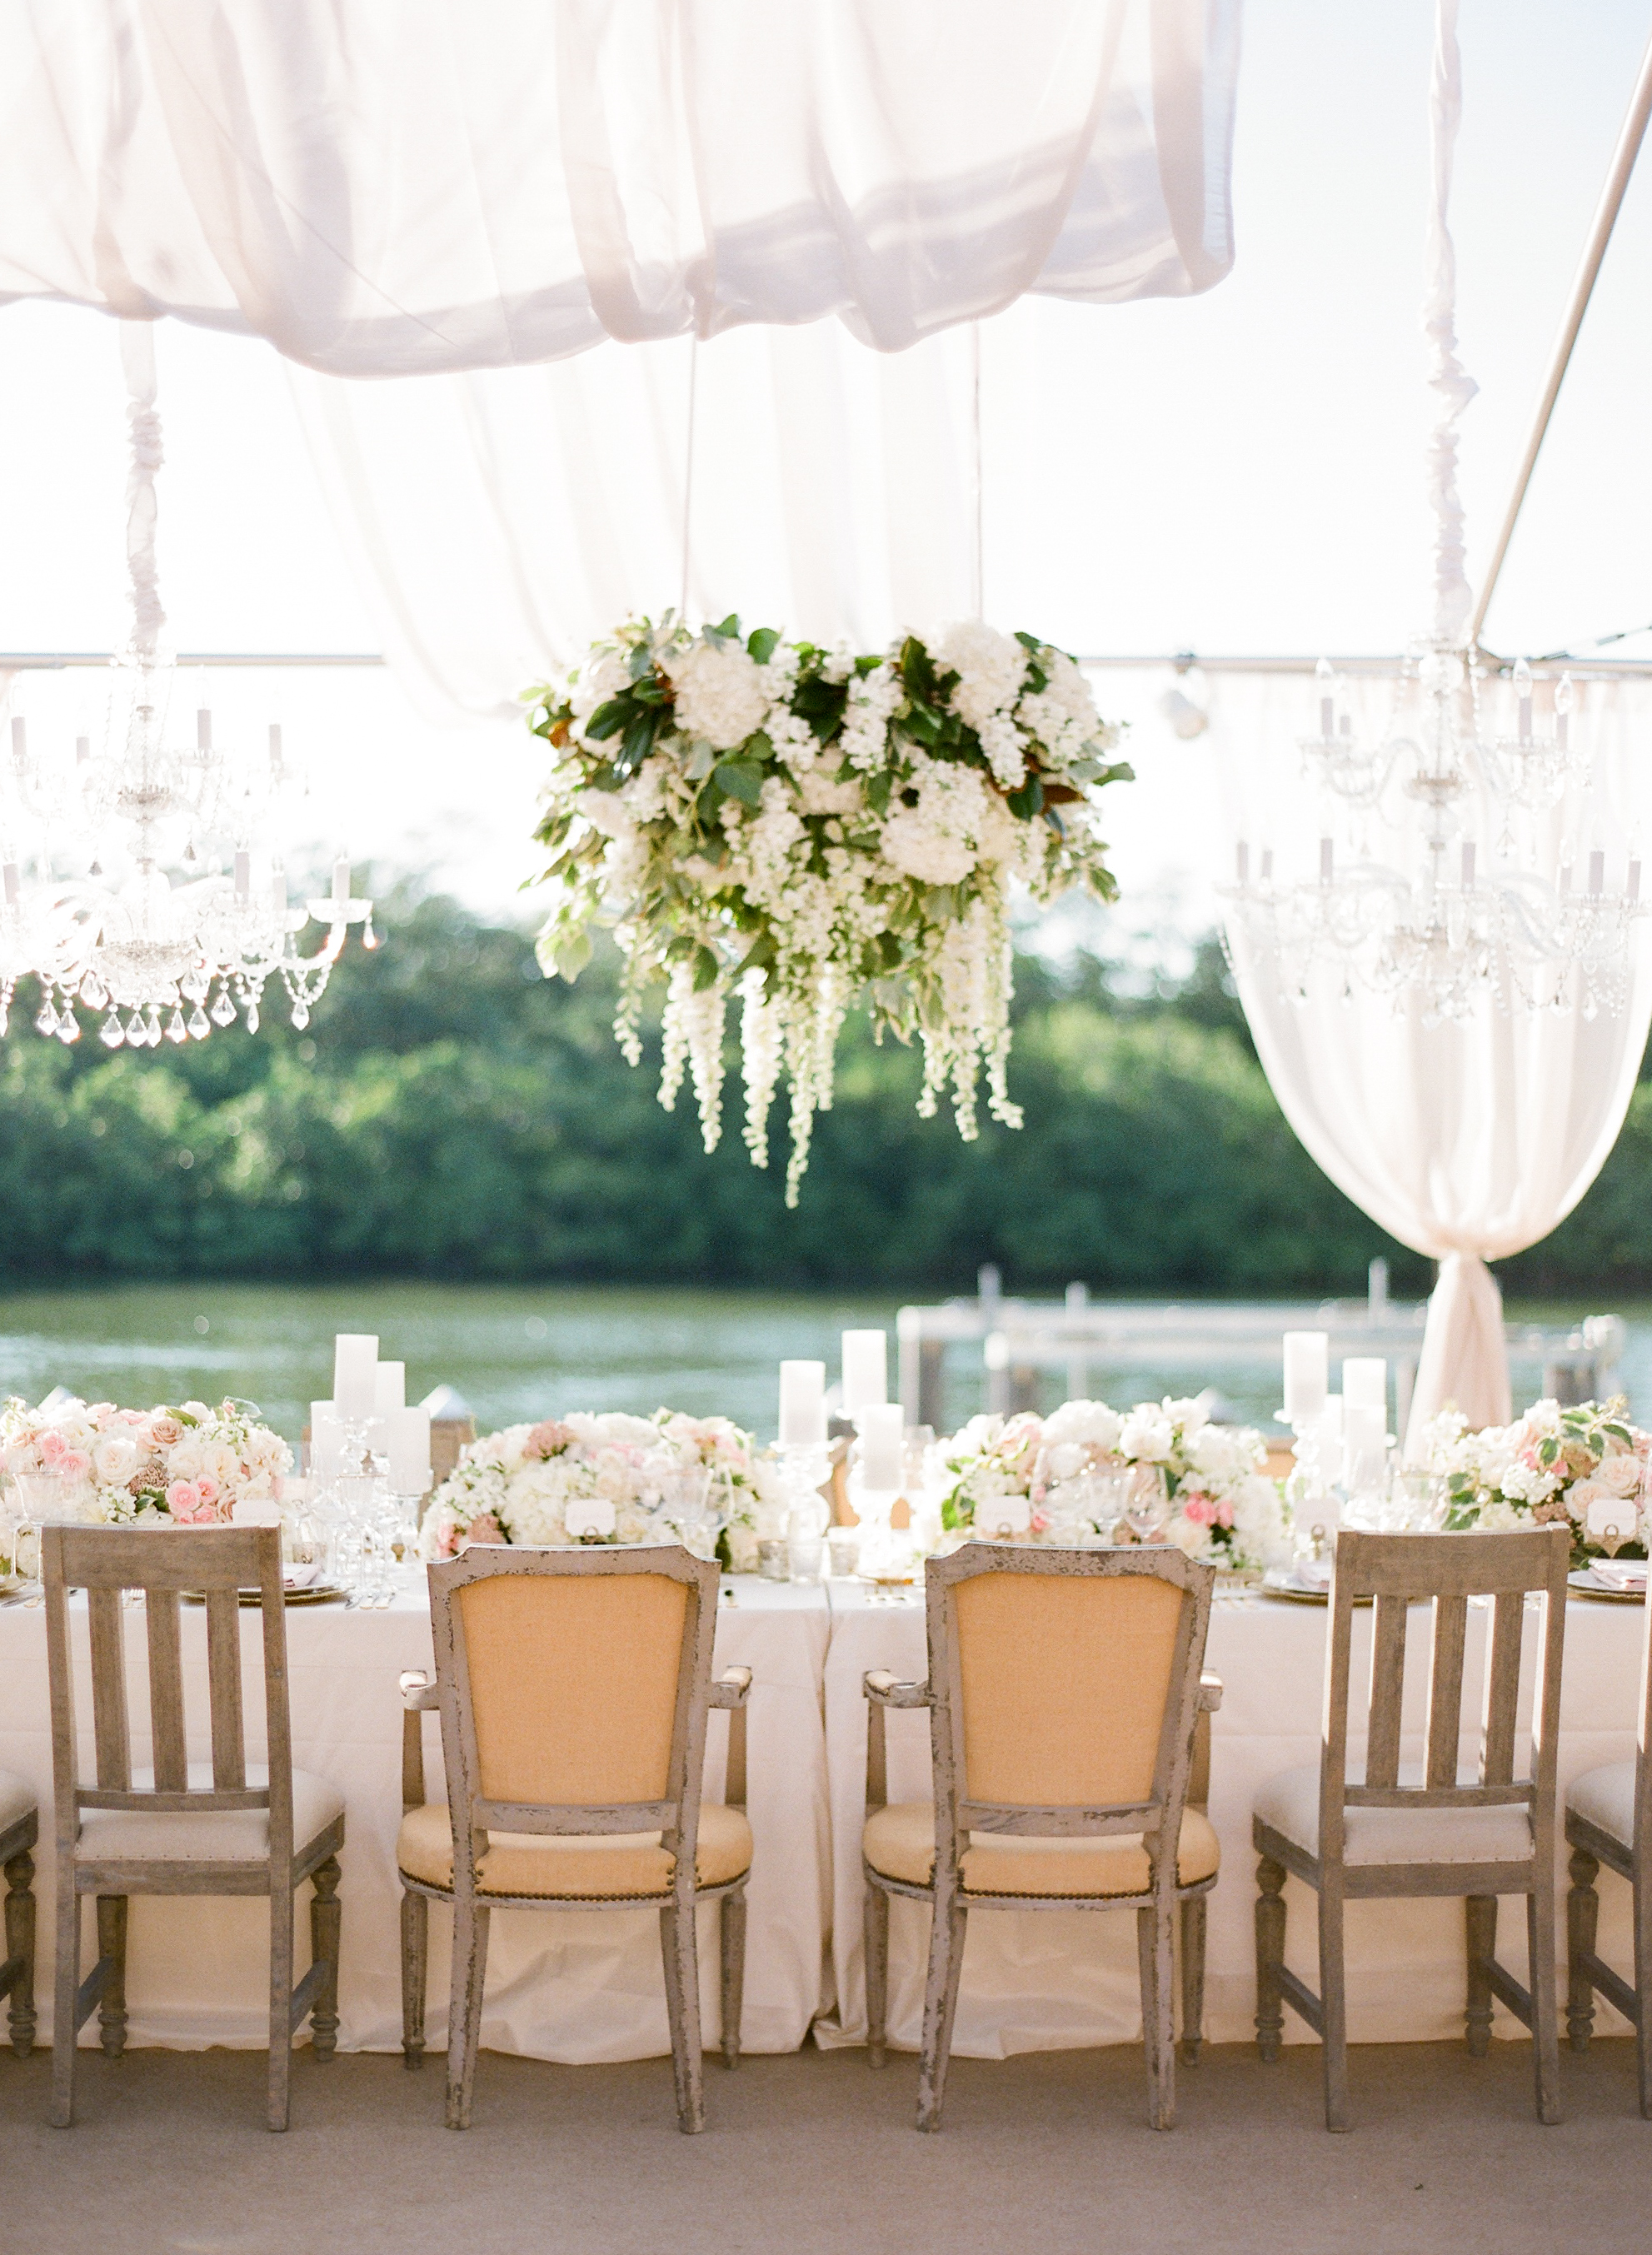 Ceci_New_York_Florida_Wedding_Style_Bride_Watercolor_Real_Custom_Luxury_12.jpg